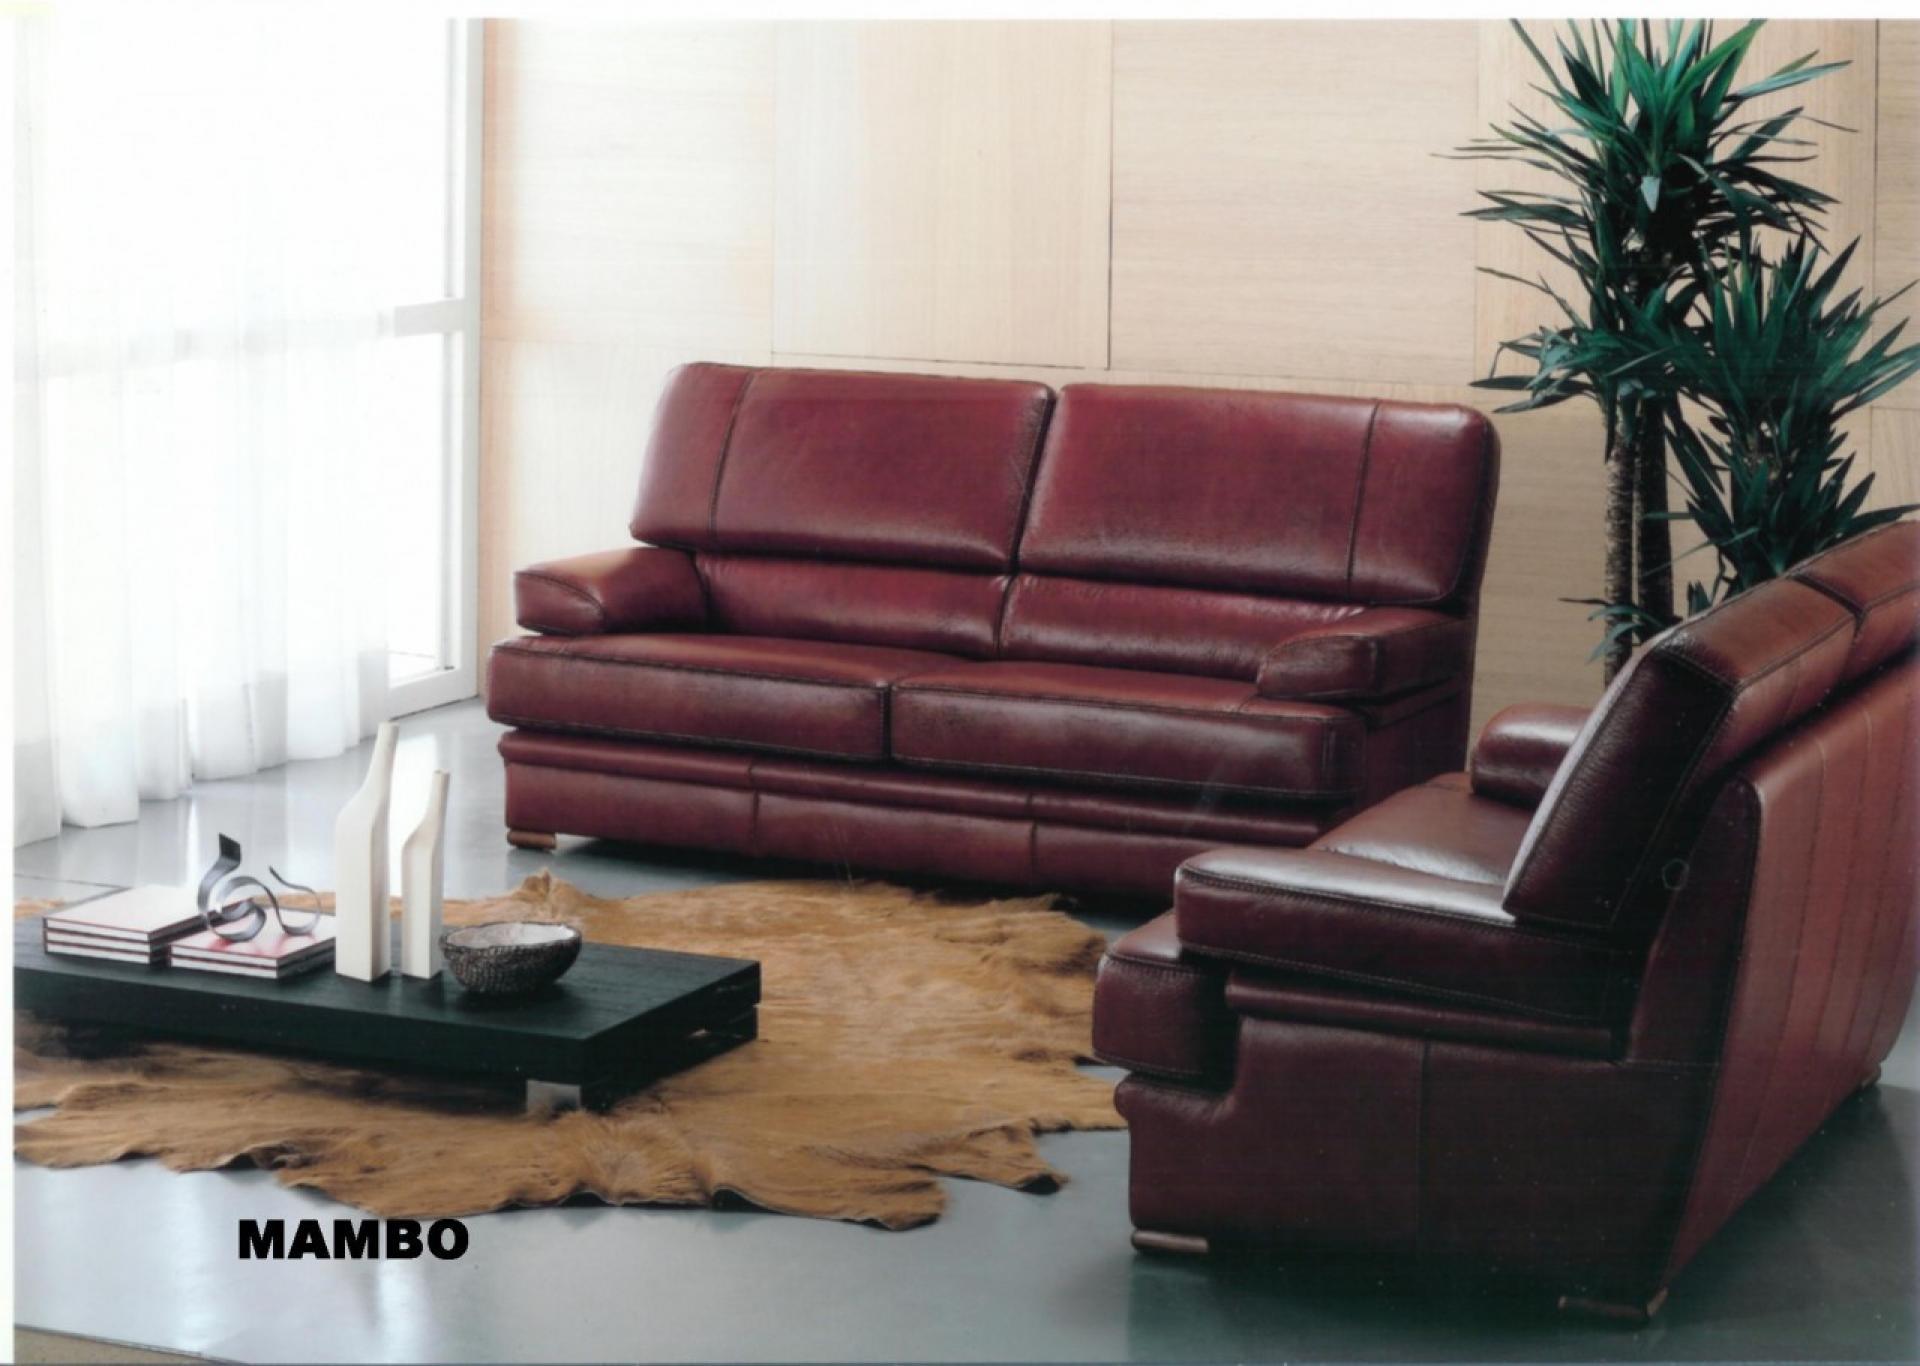 Photos canap design cuir haut de gamme - Canape cuir italien haut gamme ...